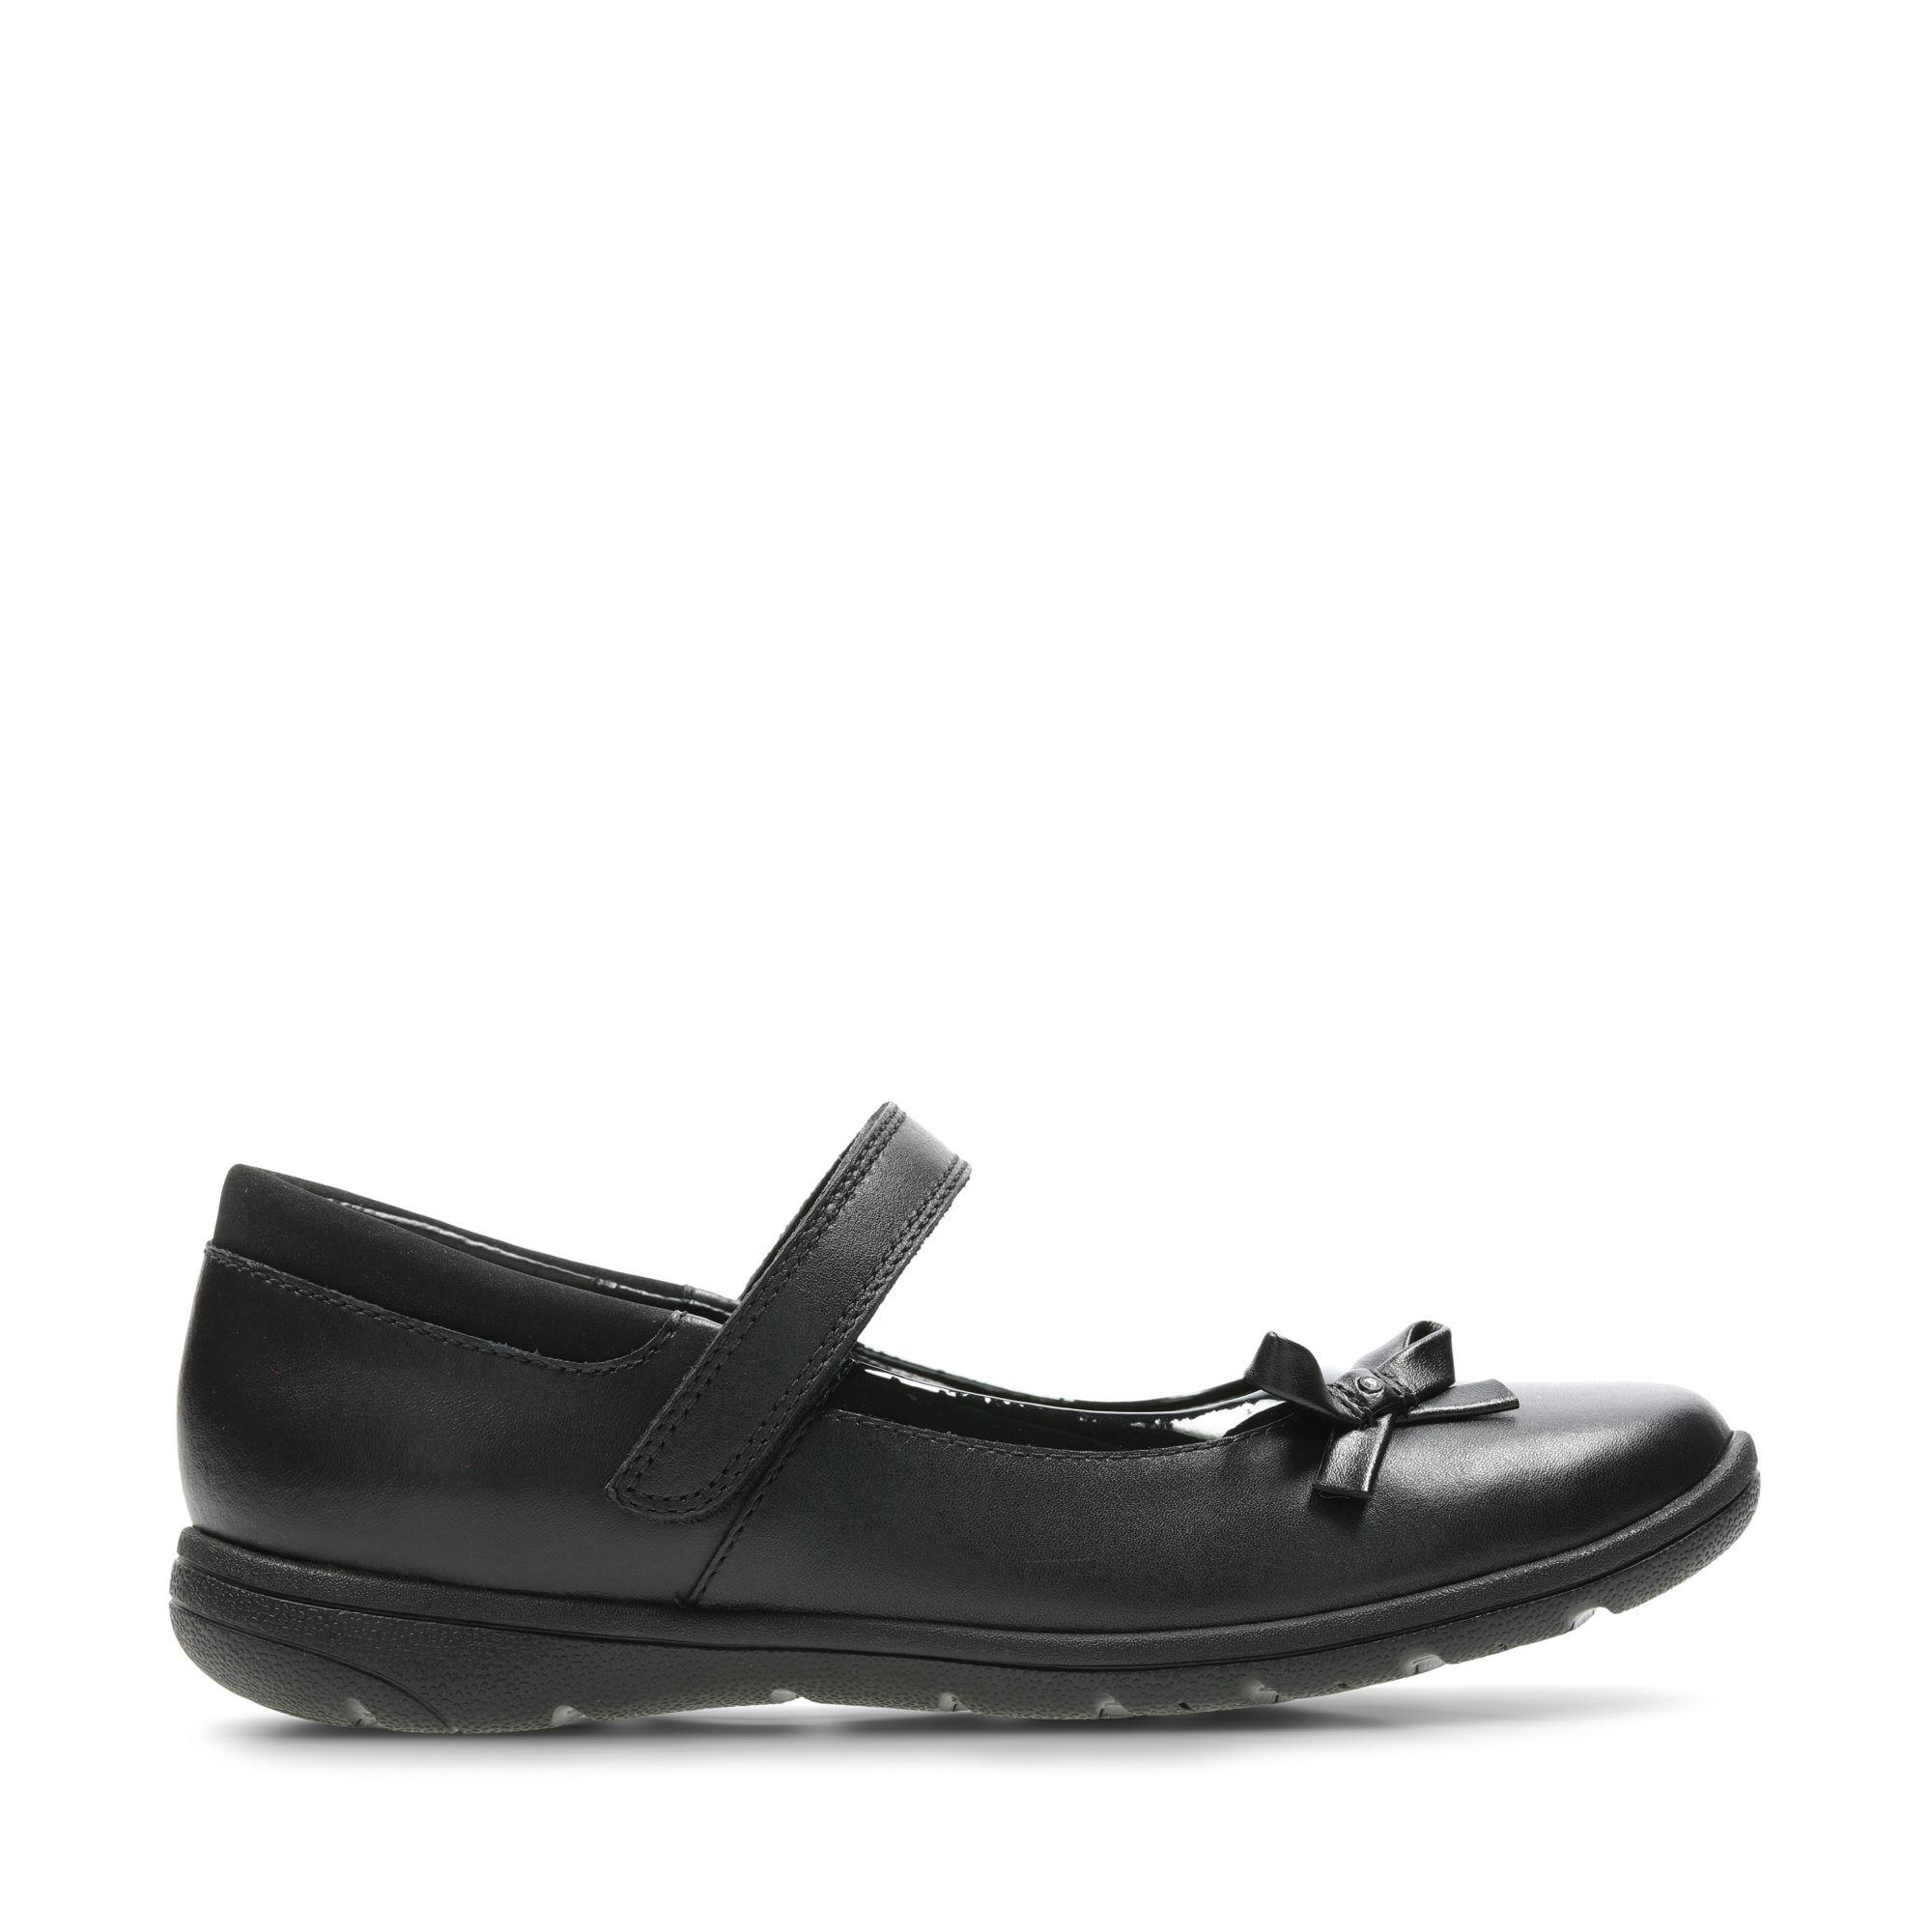 Clarks Venture Star - Black Leather - Childrens 13